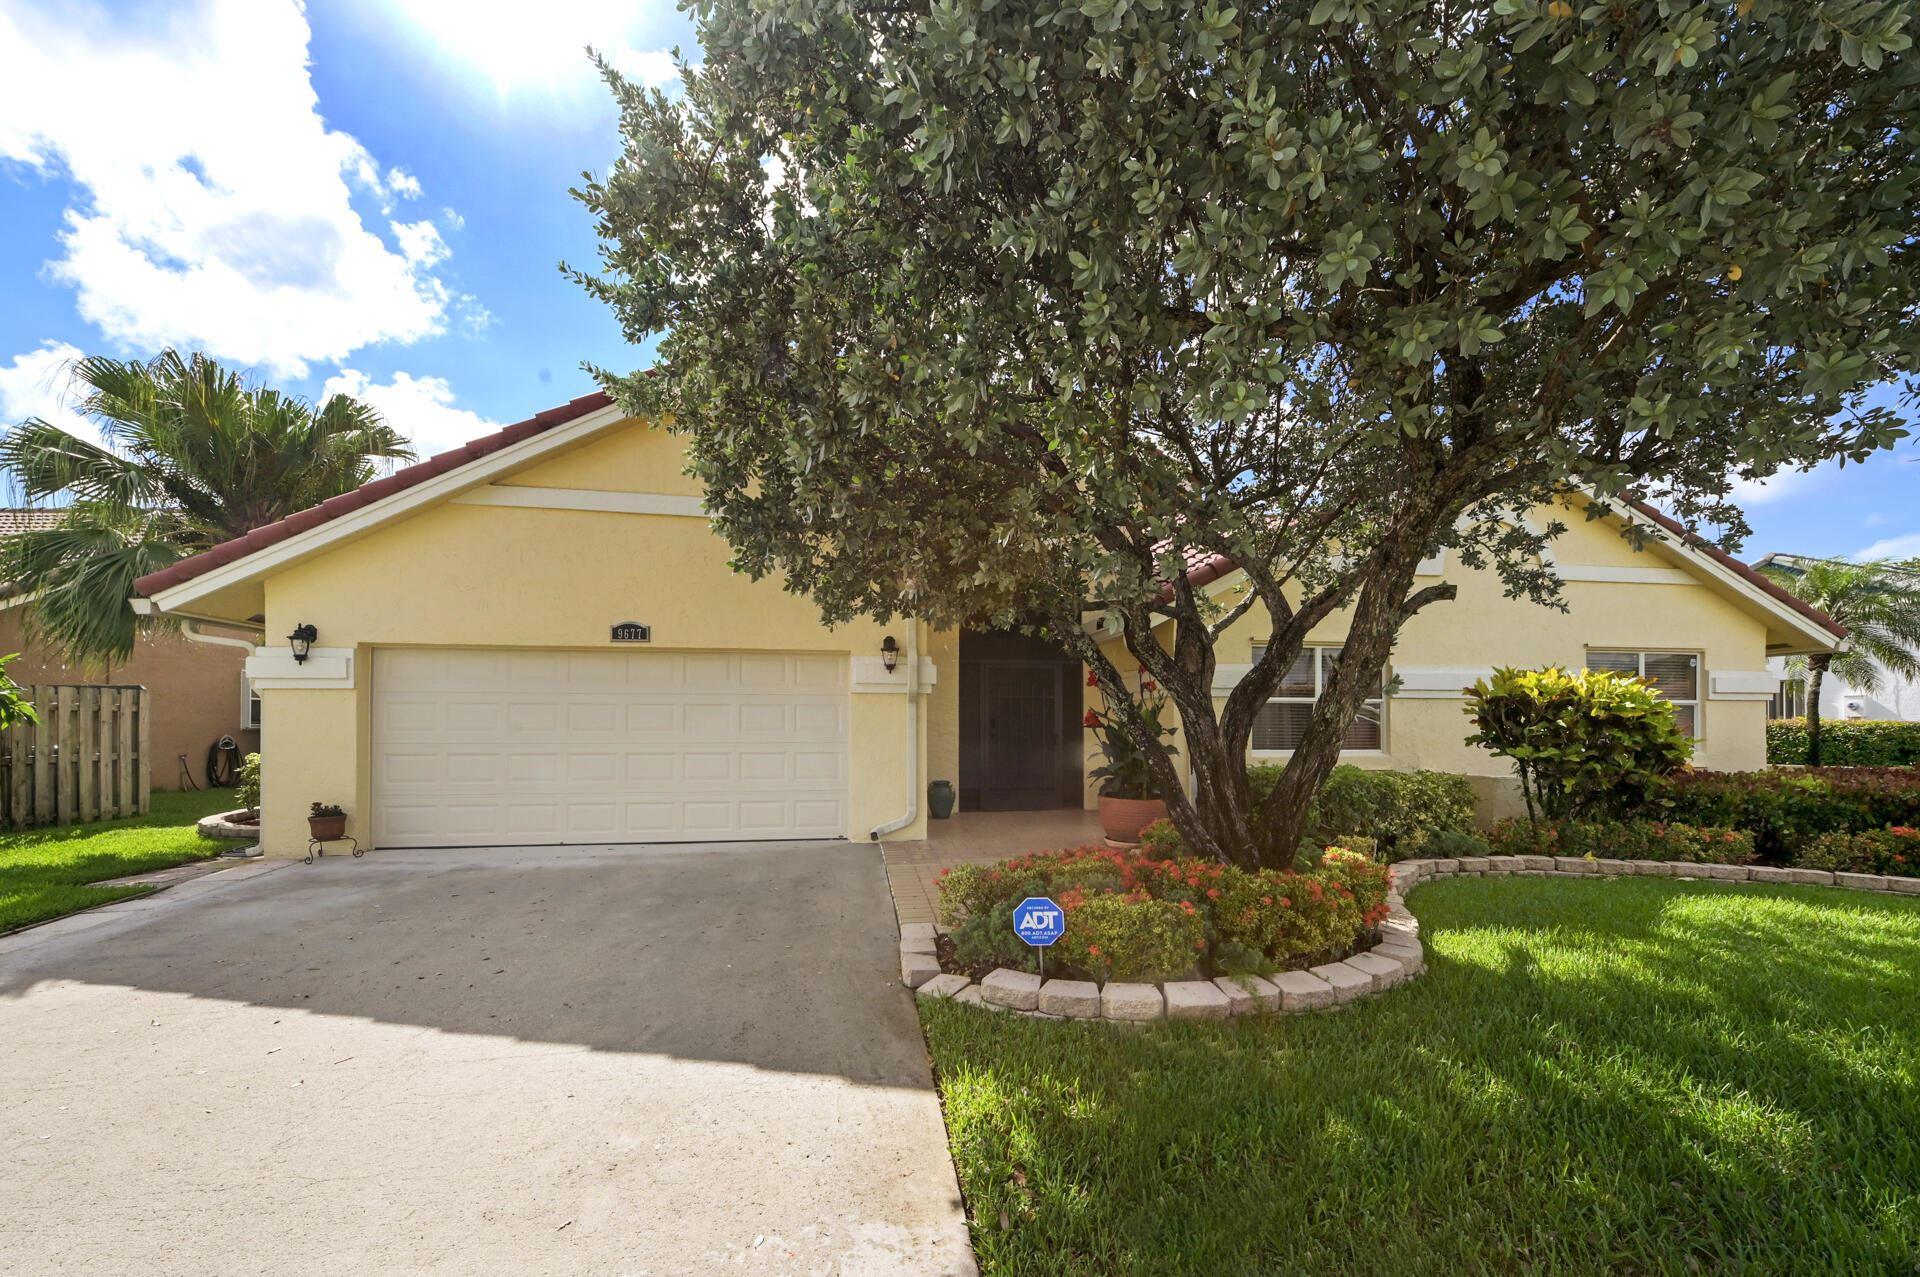 9677 El Clair Ranch #Rd, Boynton Beach, FL 33437 - MLS#: RX-10729550